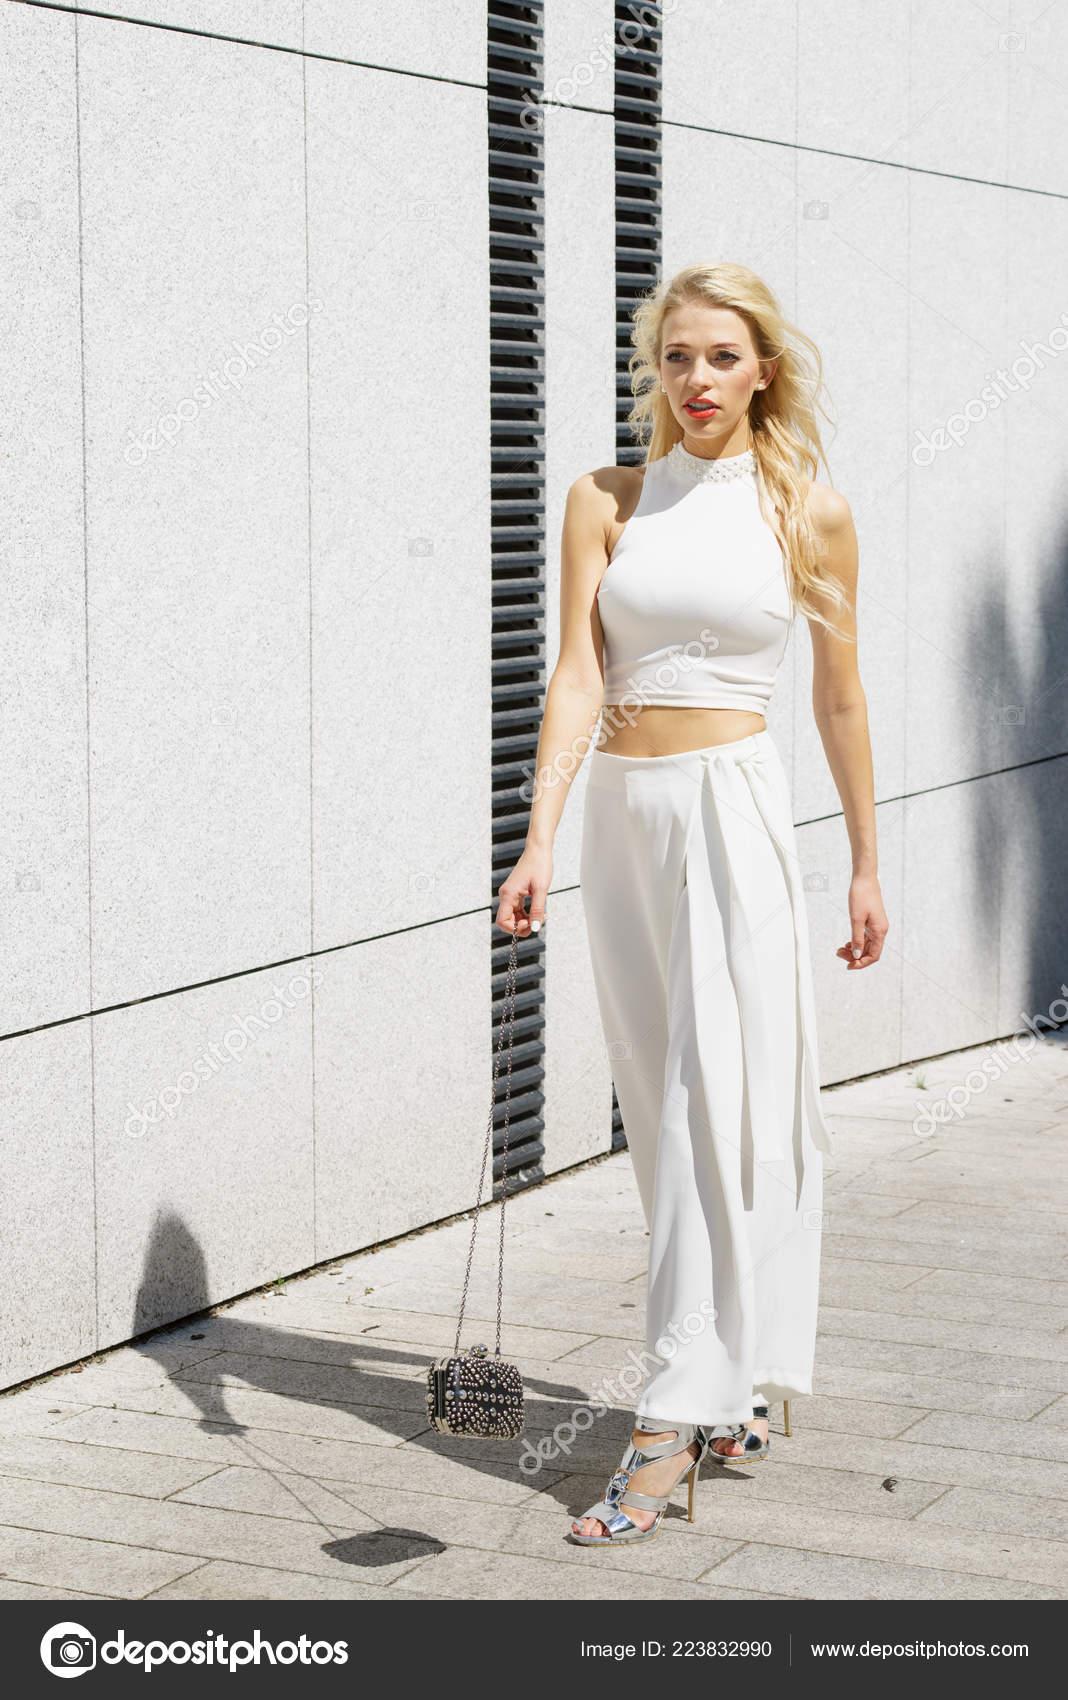 491aca3589a6 Κομψά Μοντέρνα Γυναίκα Παρουσιάζει Μοντέρνο Αστικό Ντύσιμο Λευκό Crop Top– εικόνα  αρχείου